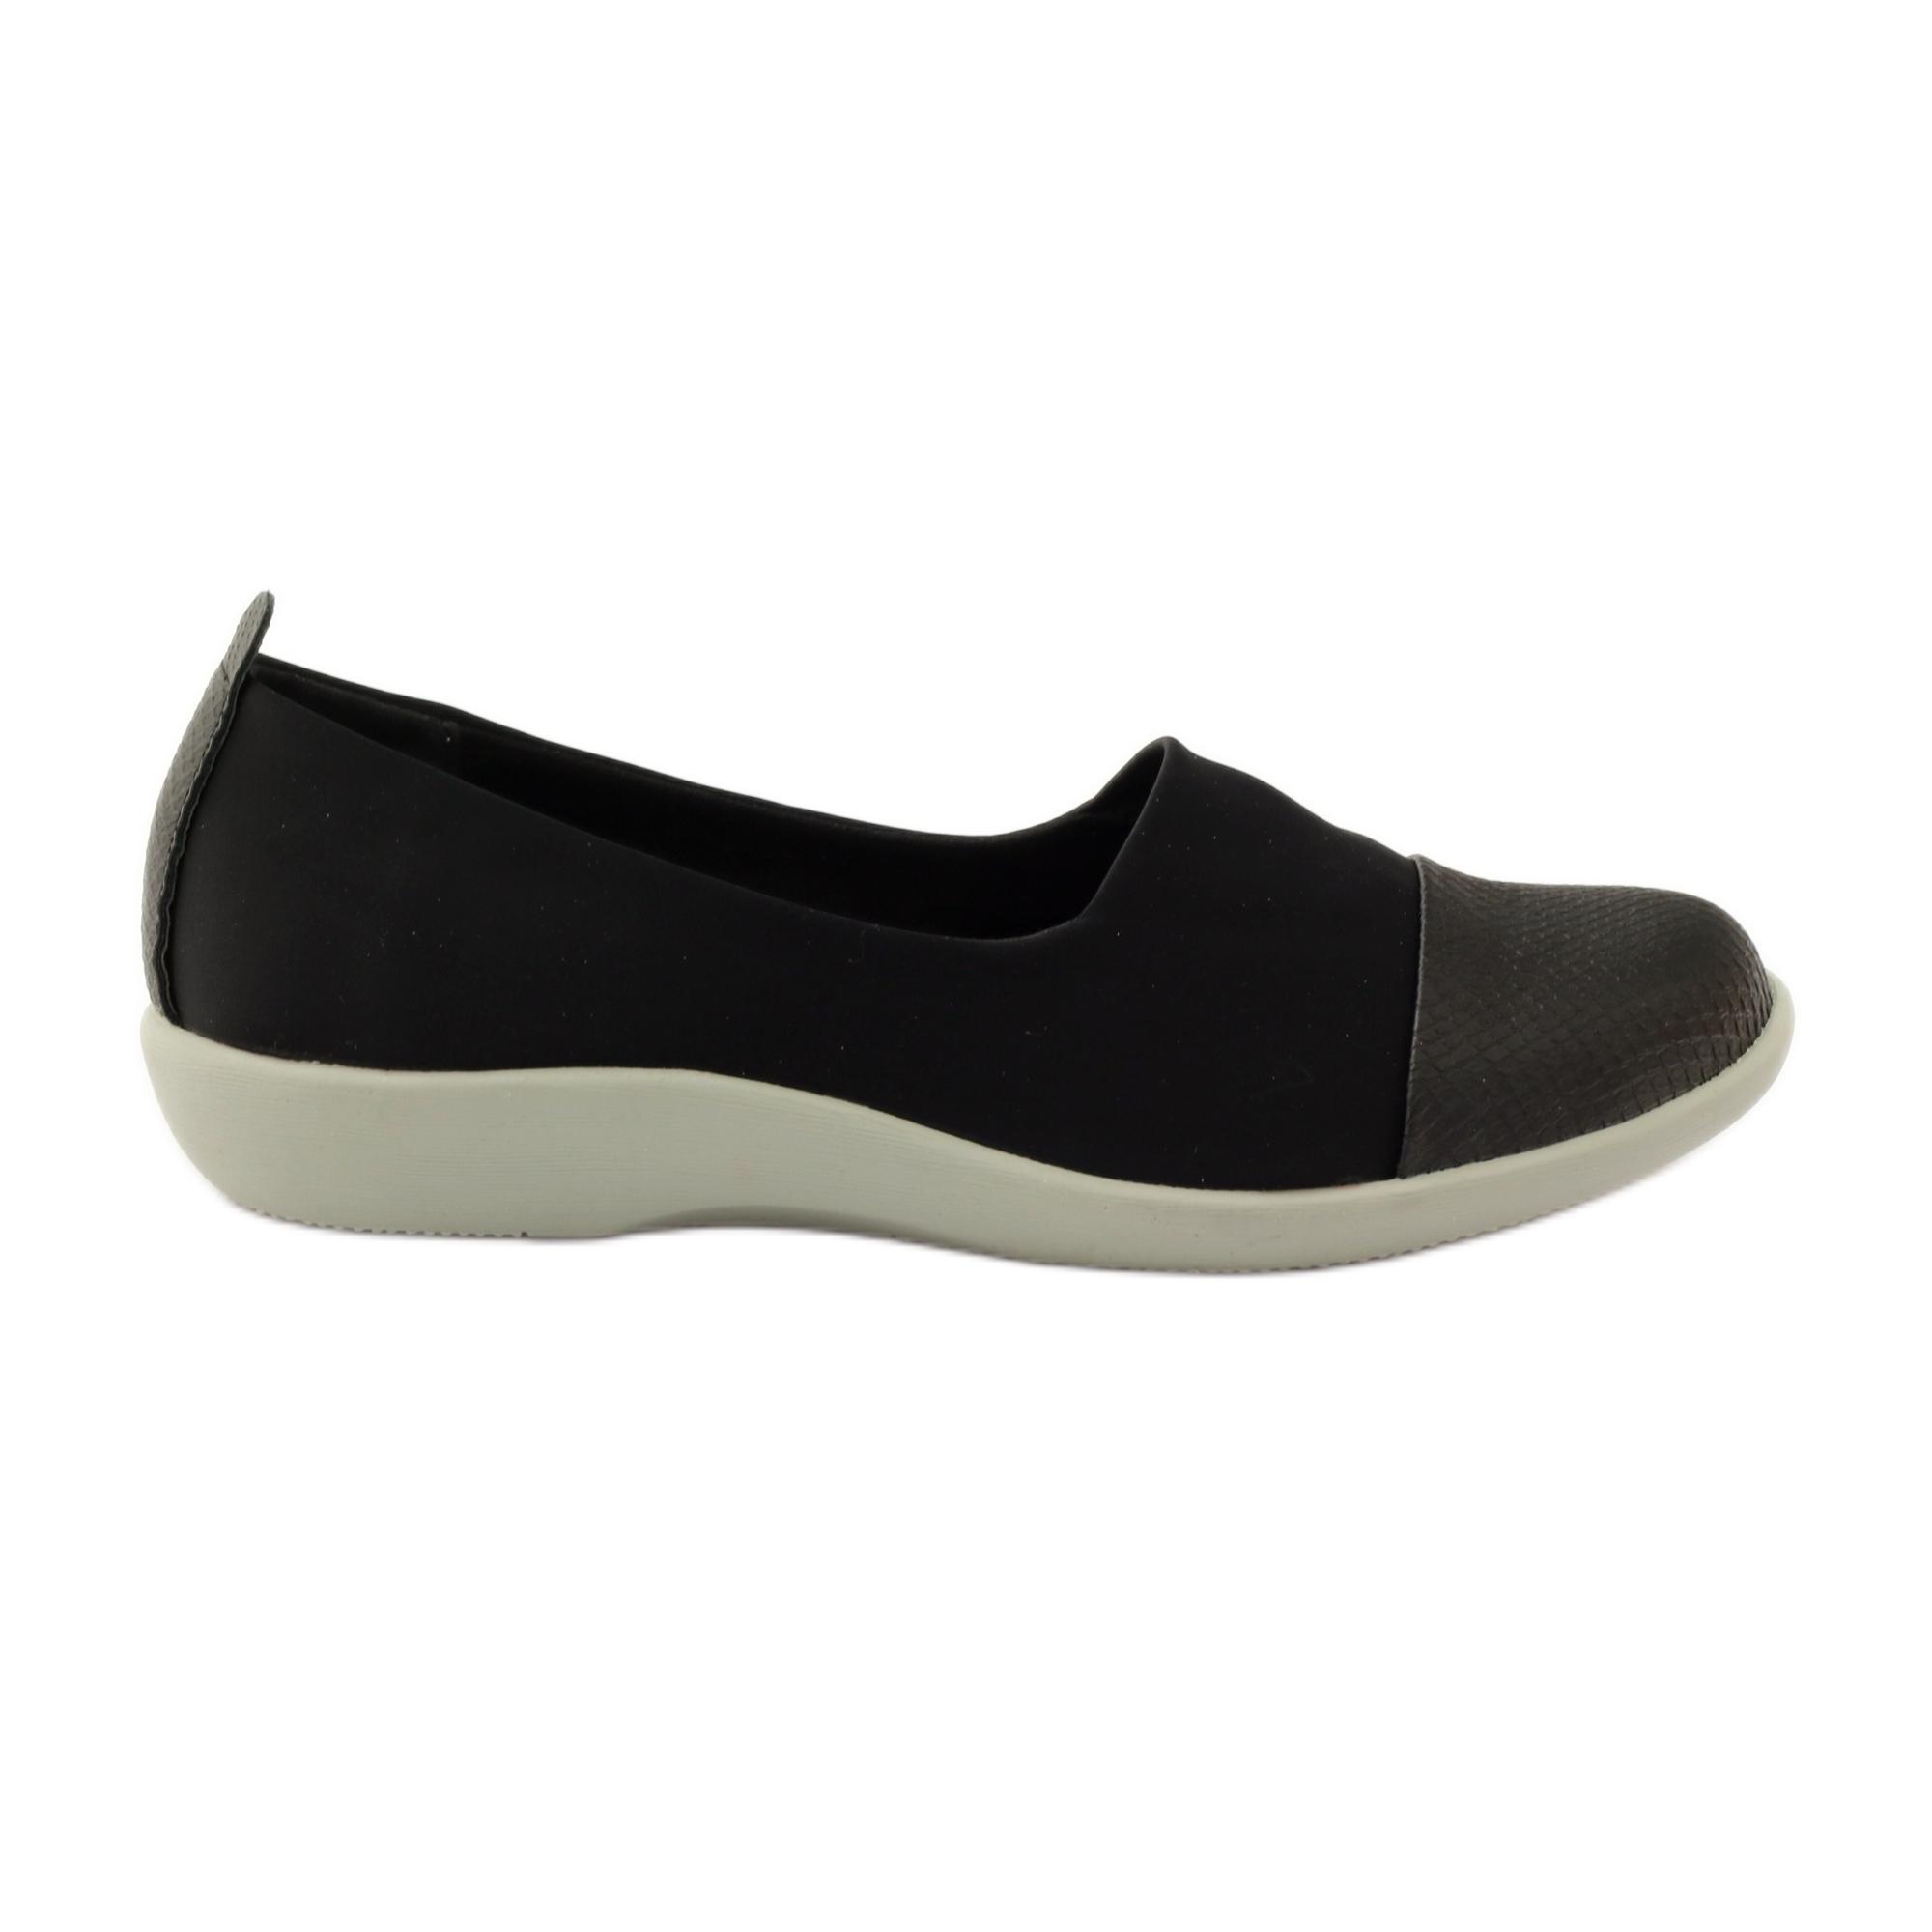 purchase cheap d369d a5ca1 Schwarz Sehr bequeme Schuhe Aloeloe Slipons